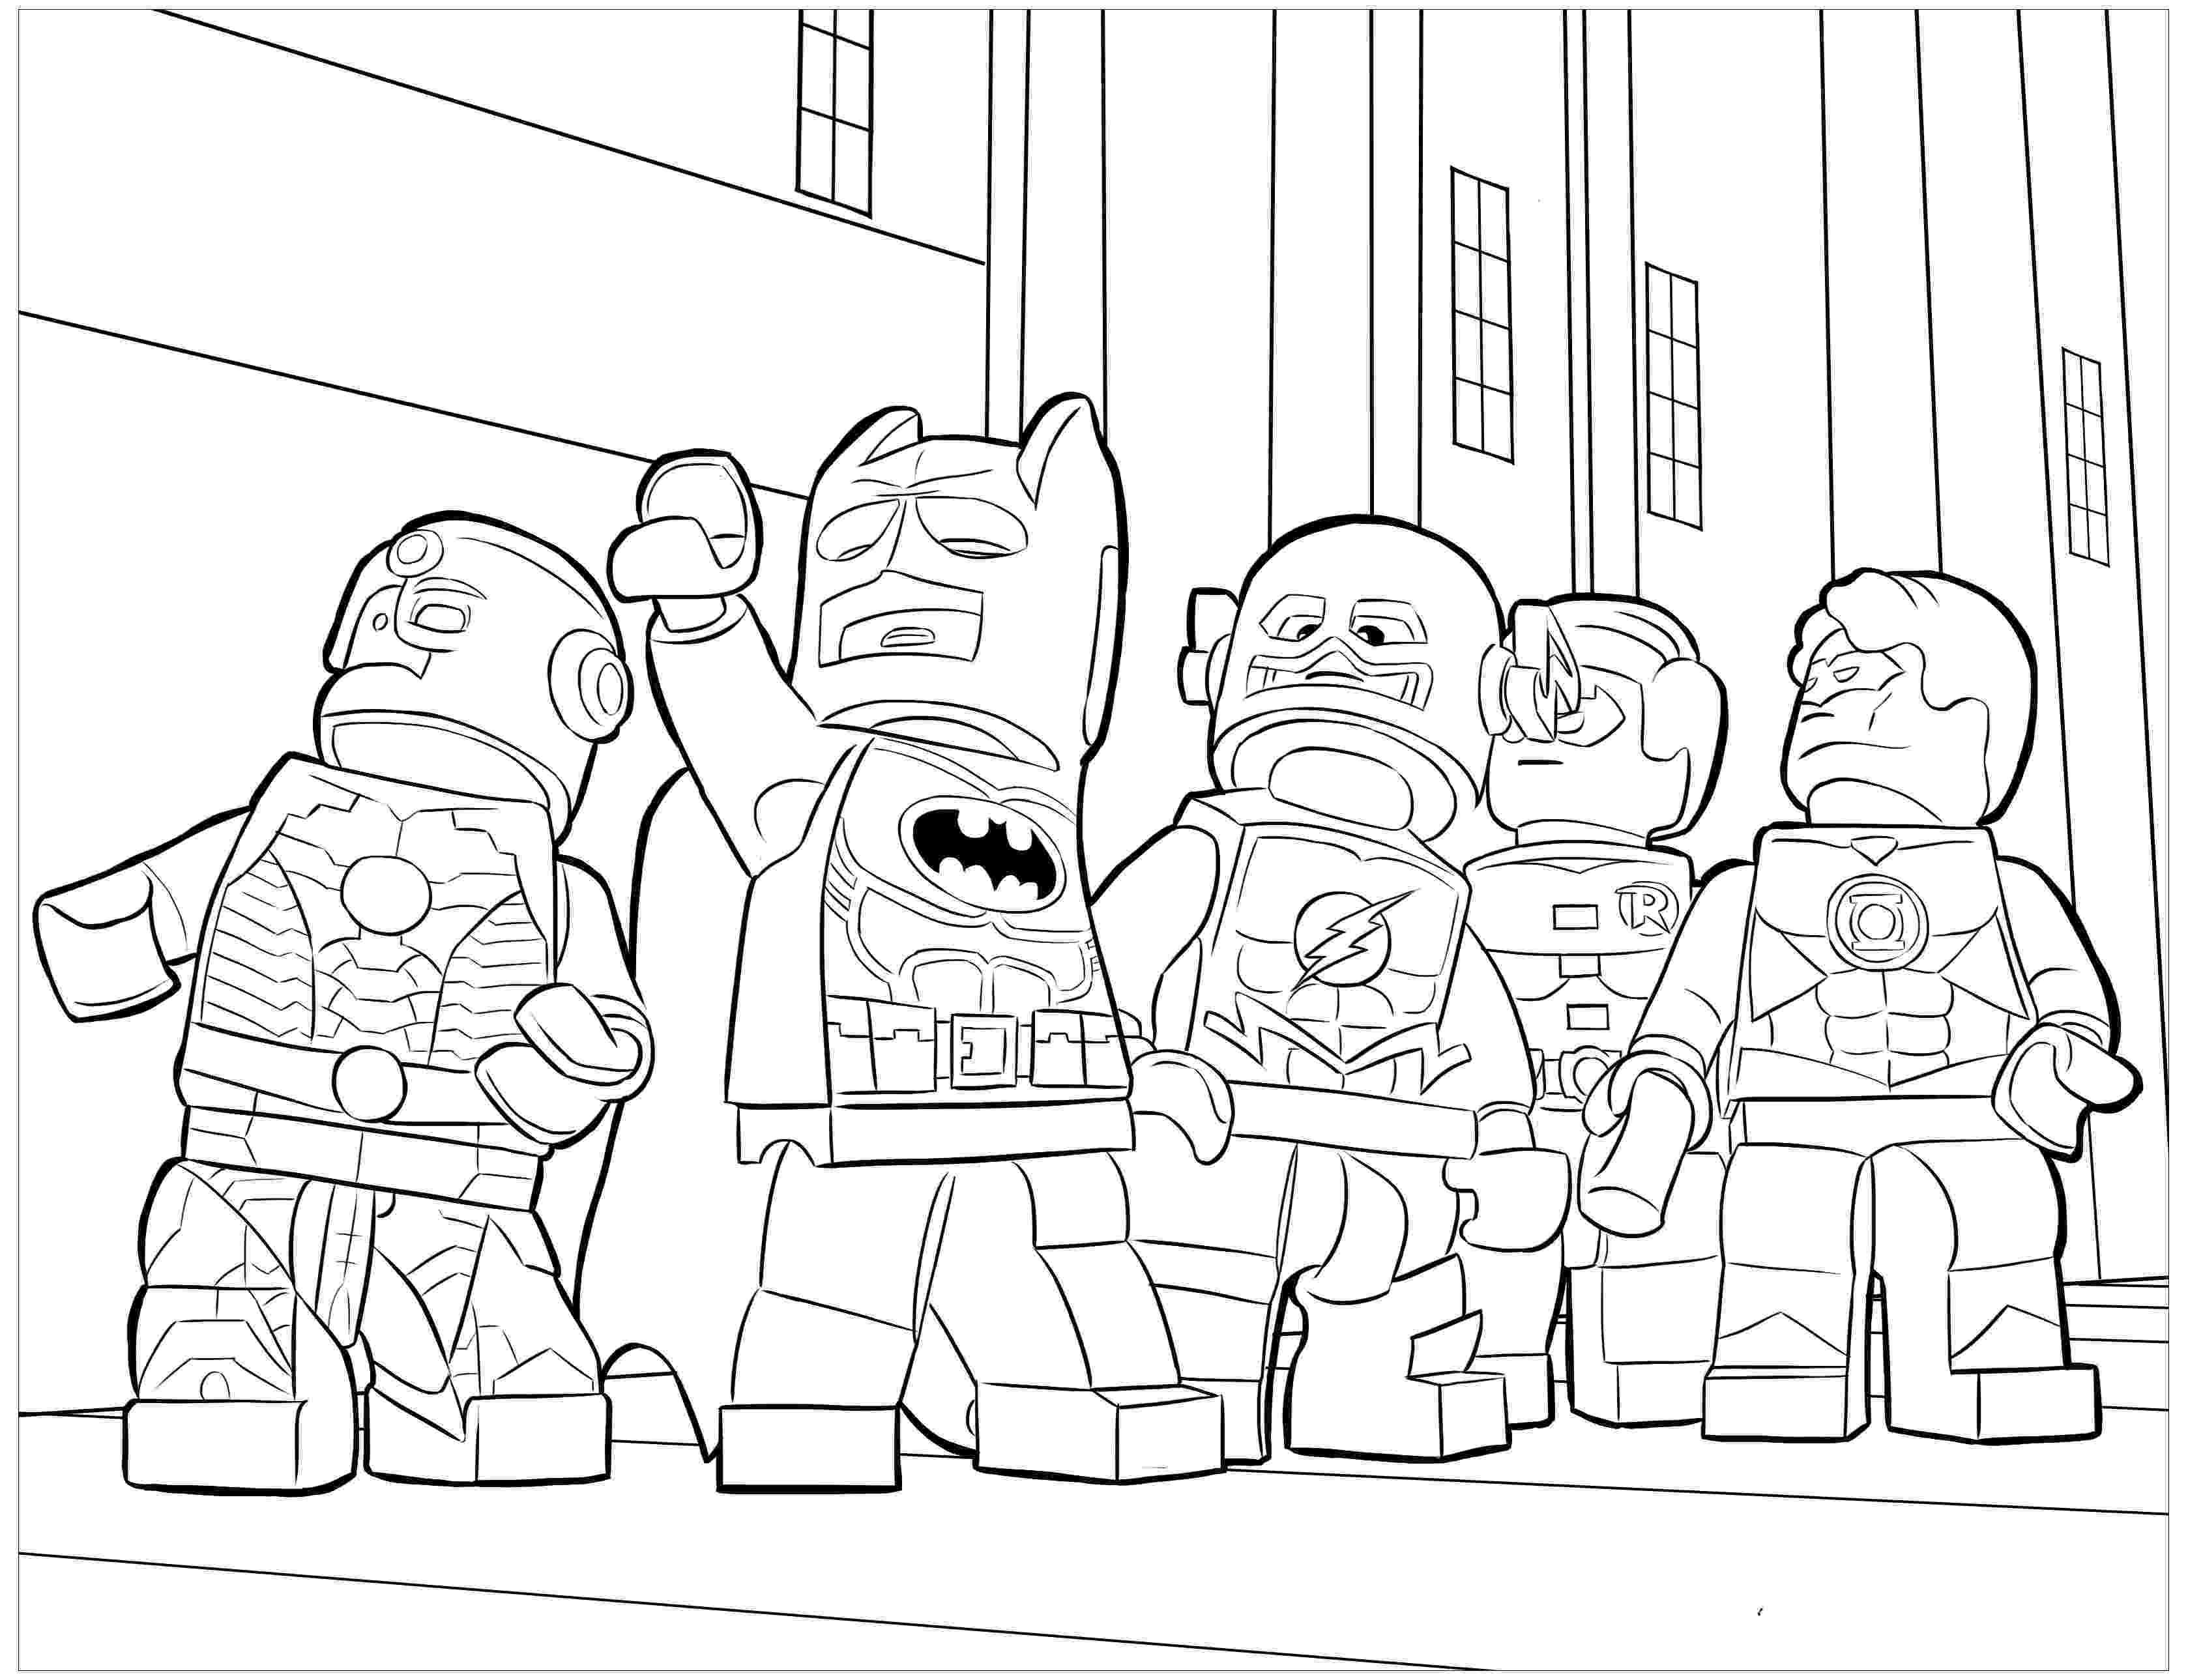 lego batman pictures to colour the lego batman movie coloring pages pictures lego batman colour to